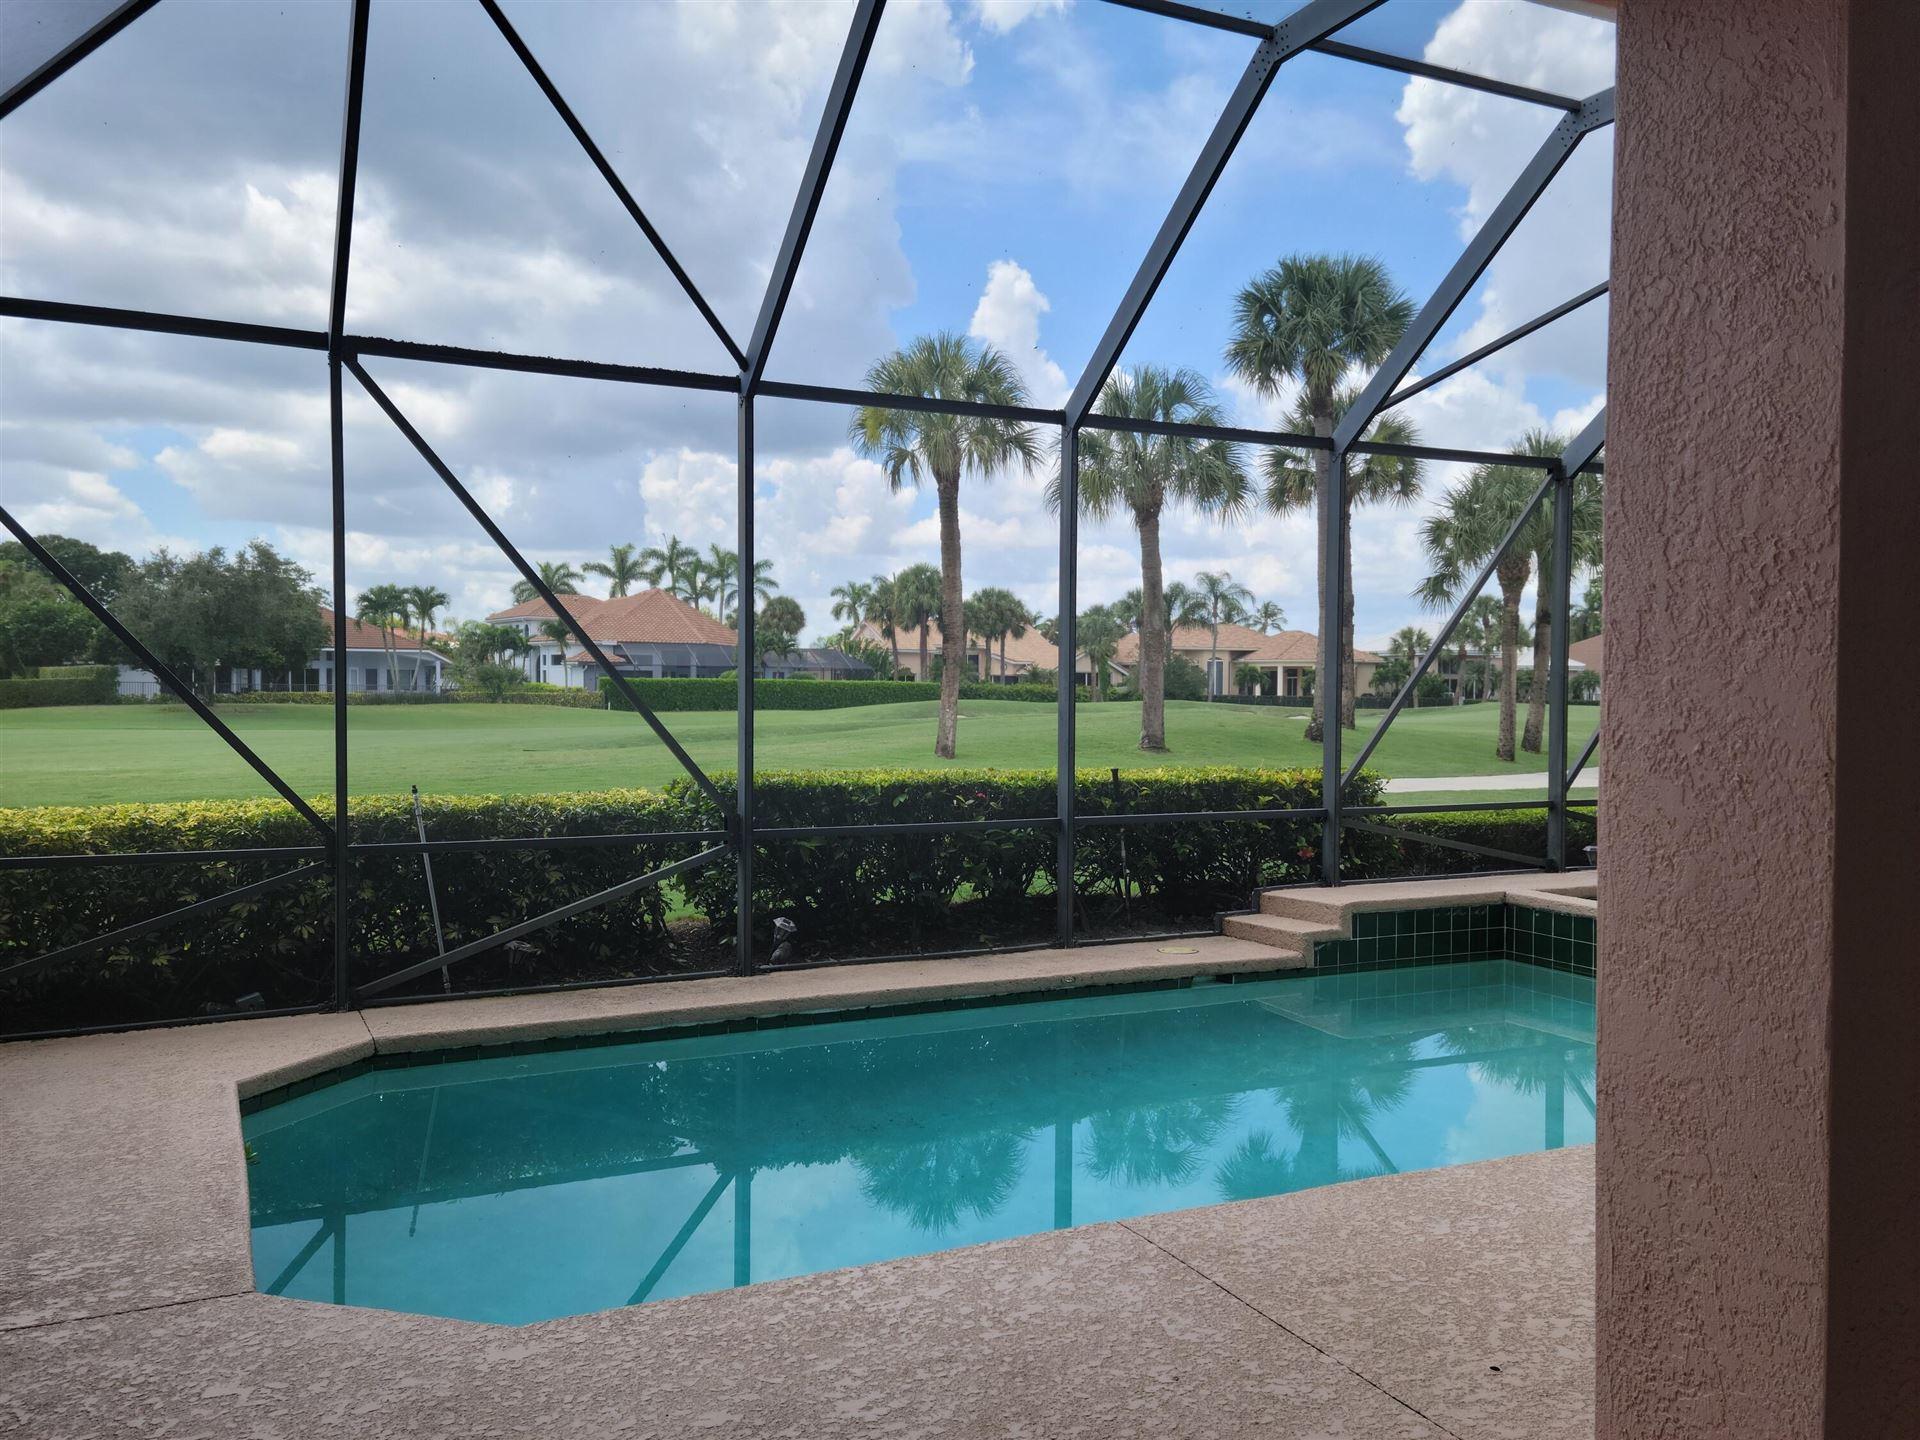 Photo of 131 Windward Drive, Palm Beach Gardens, FL 33418 (MLS # RX-10742874)